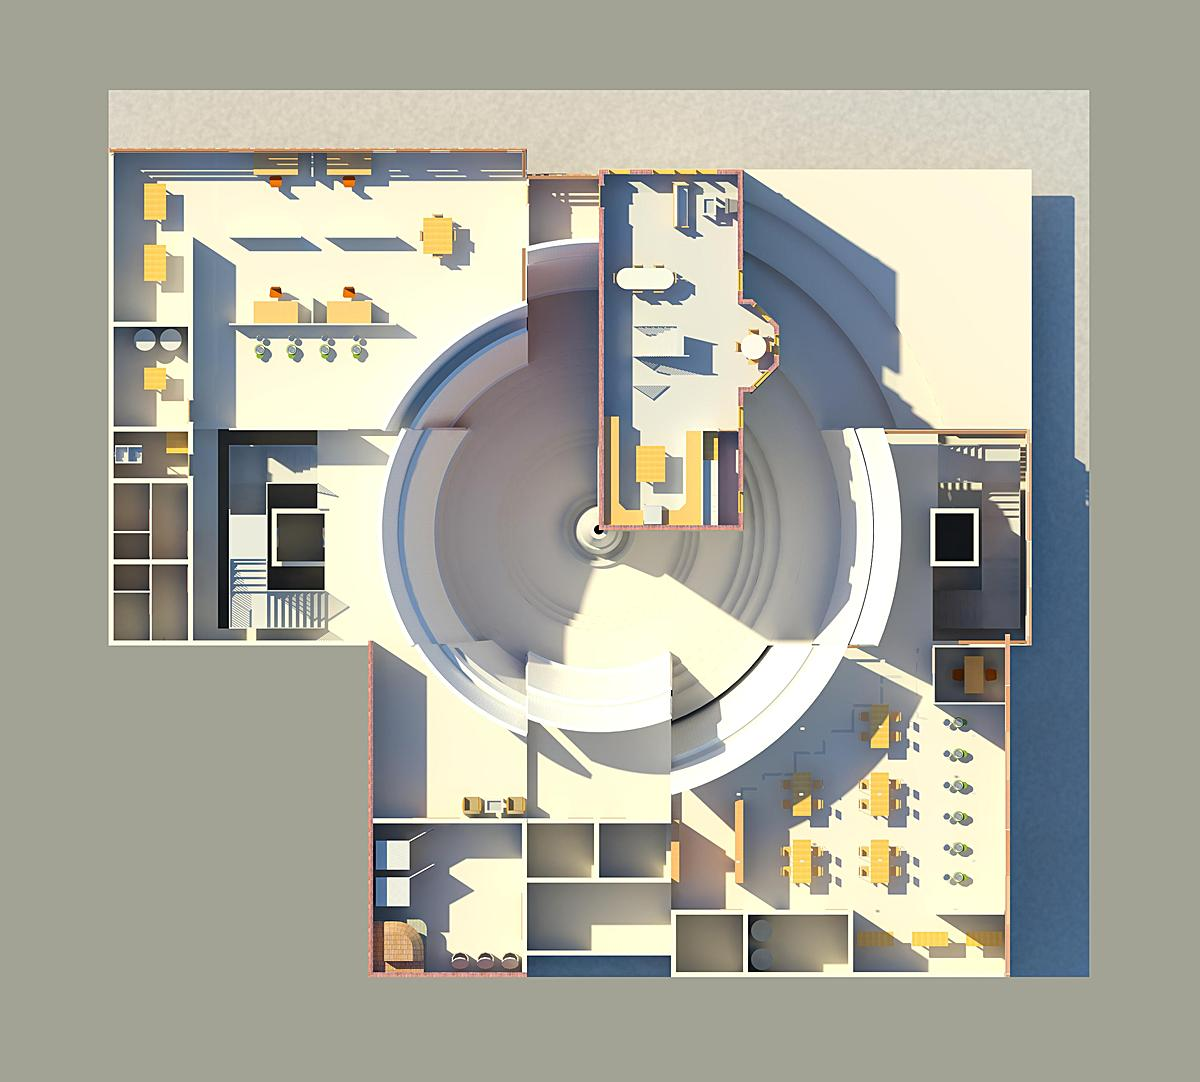 Mt adams ceramics center john j gerneth archinect for Rendered floor plan